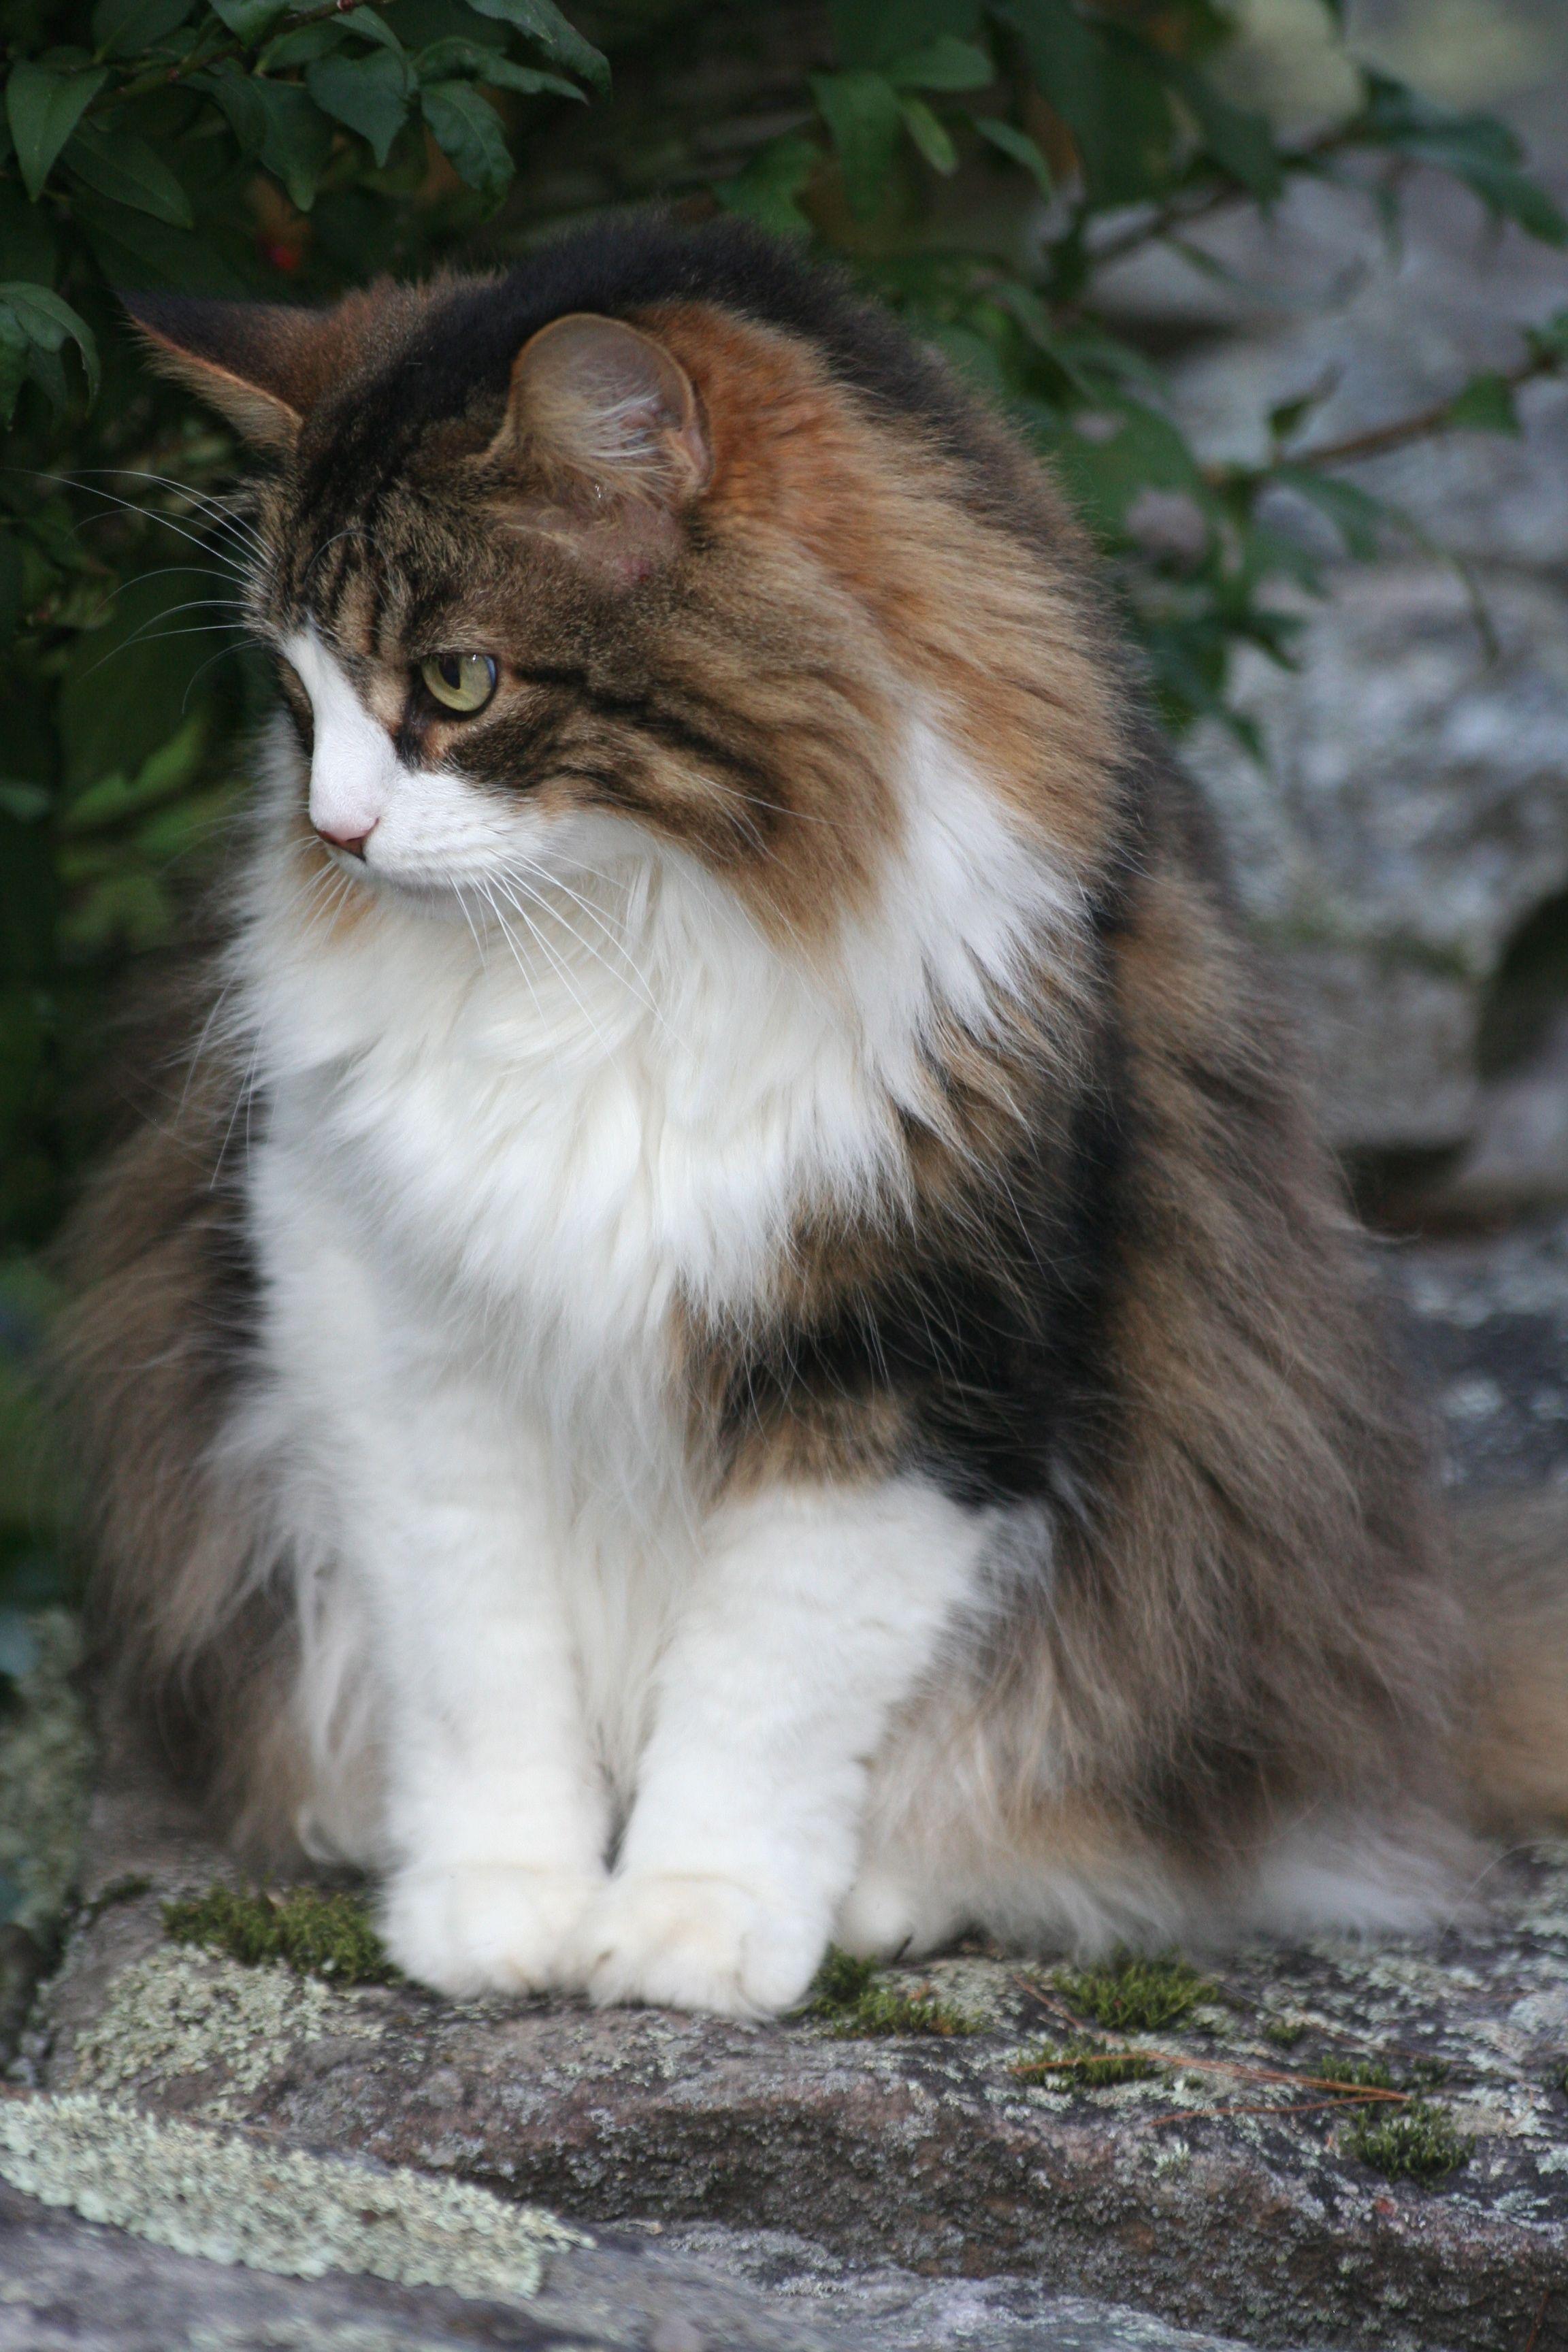 My kitty Nikko Things I Love Pinterest Kitty Cat and Animal